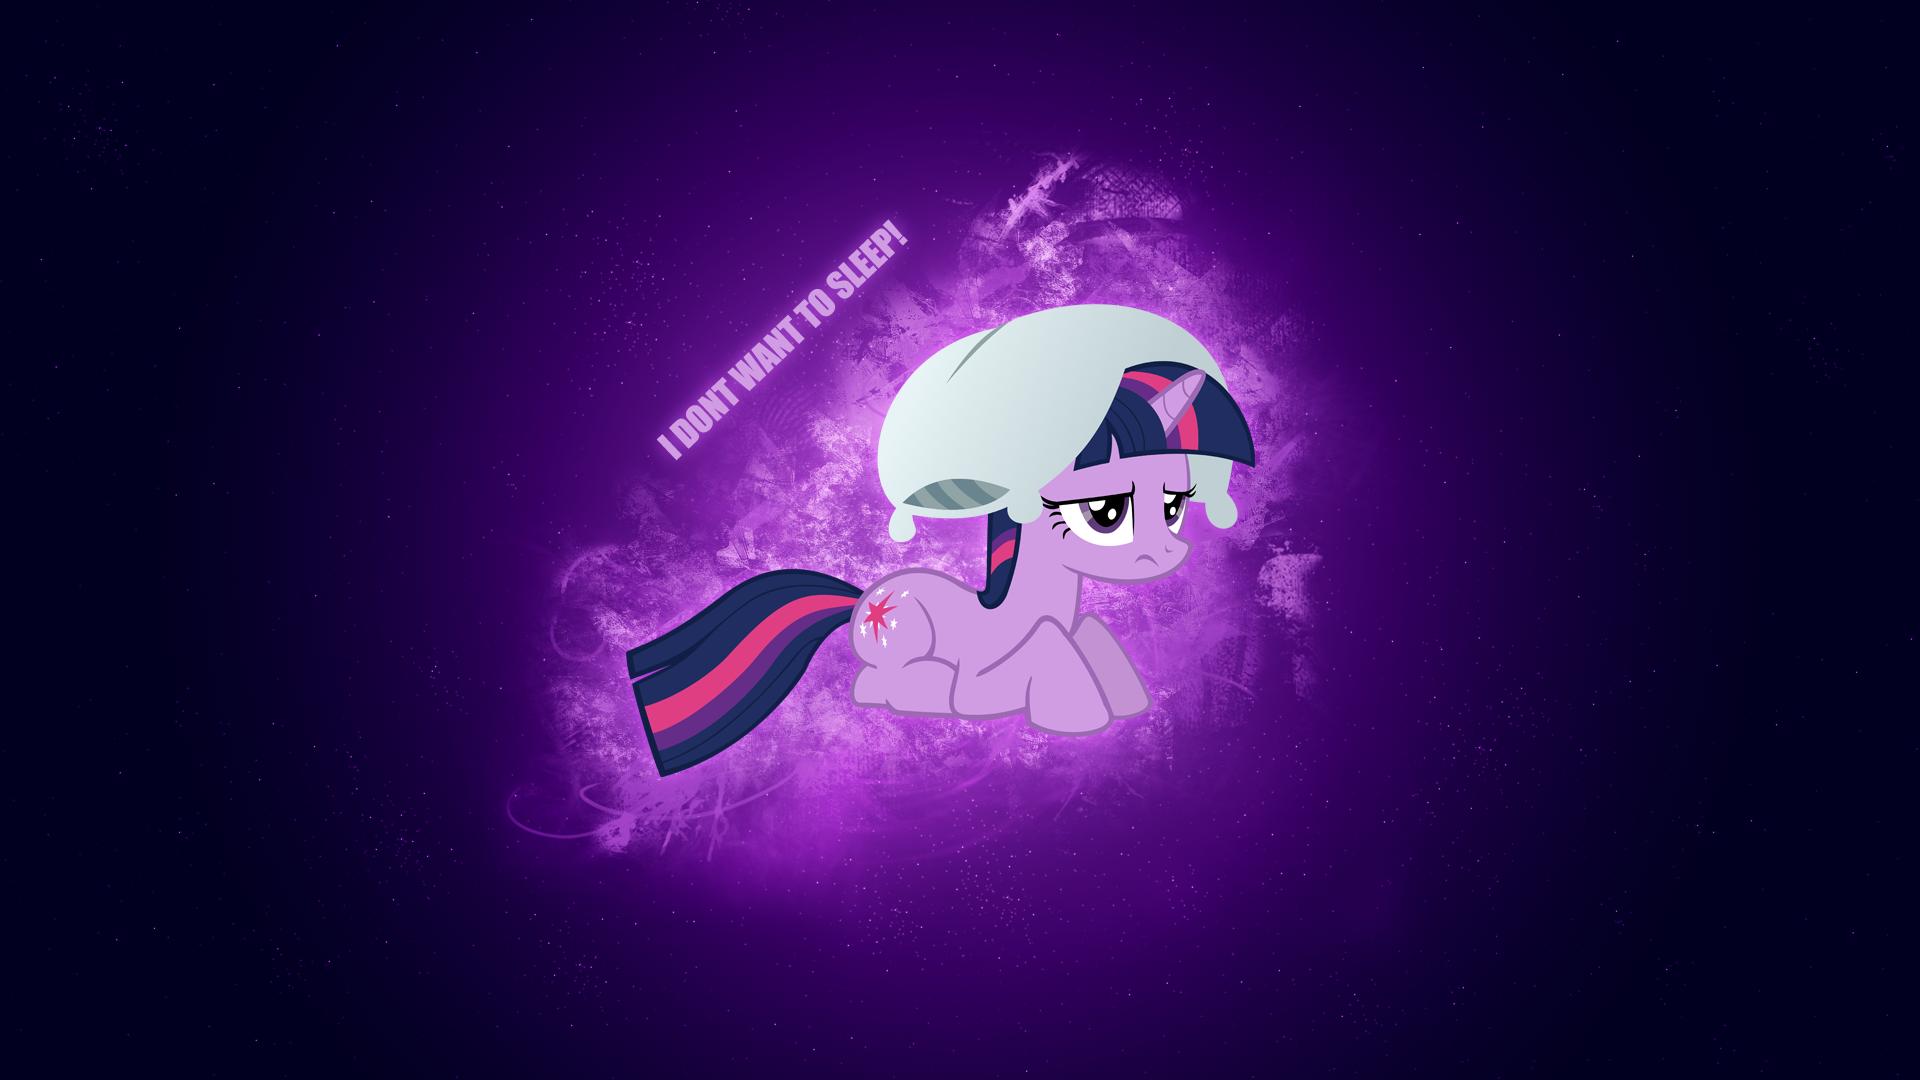 Wallpaper - Twilight Sparkle by snajperpl